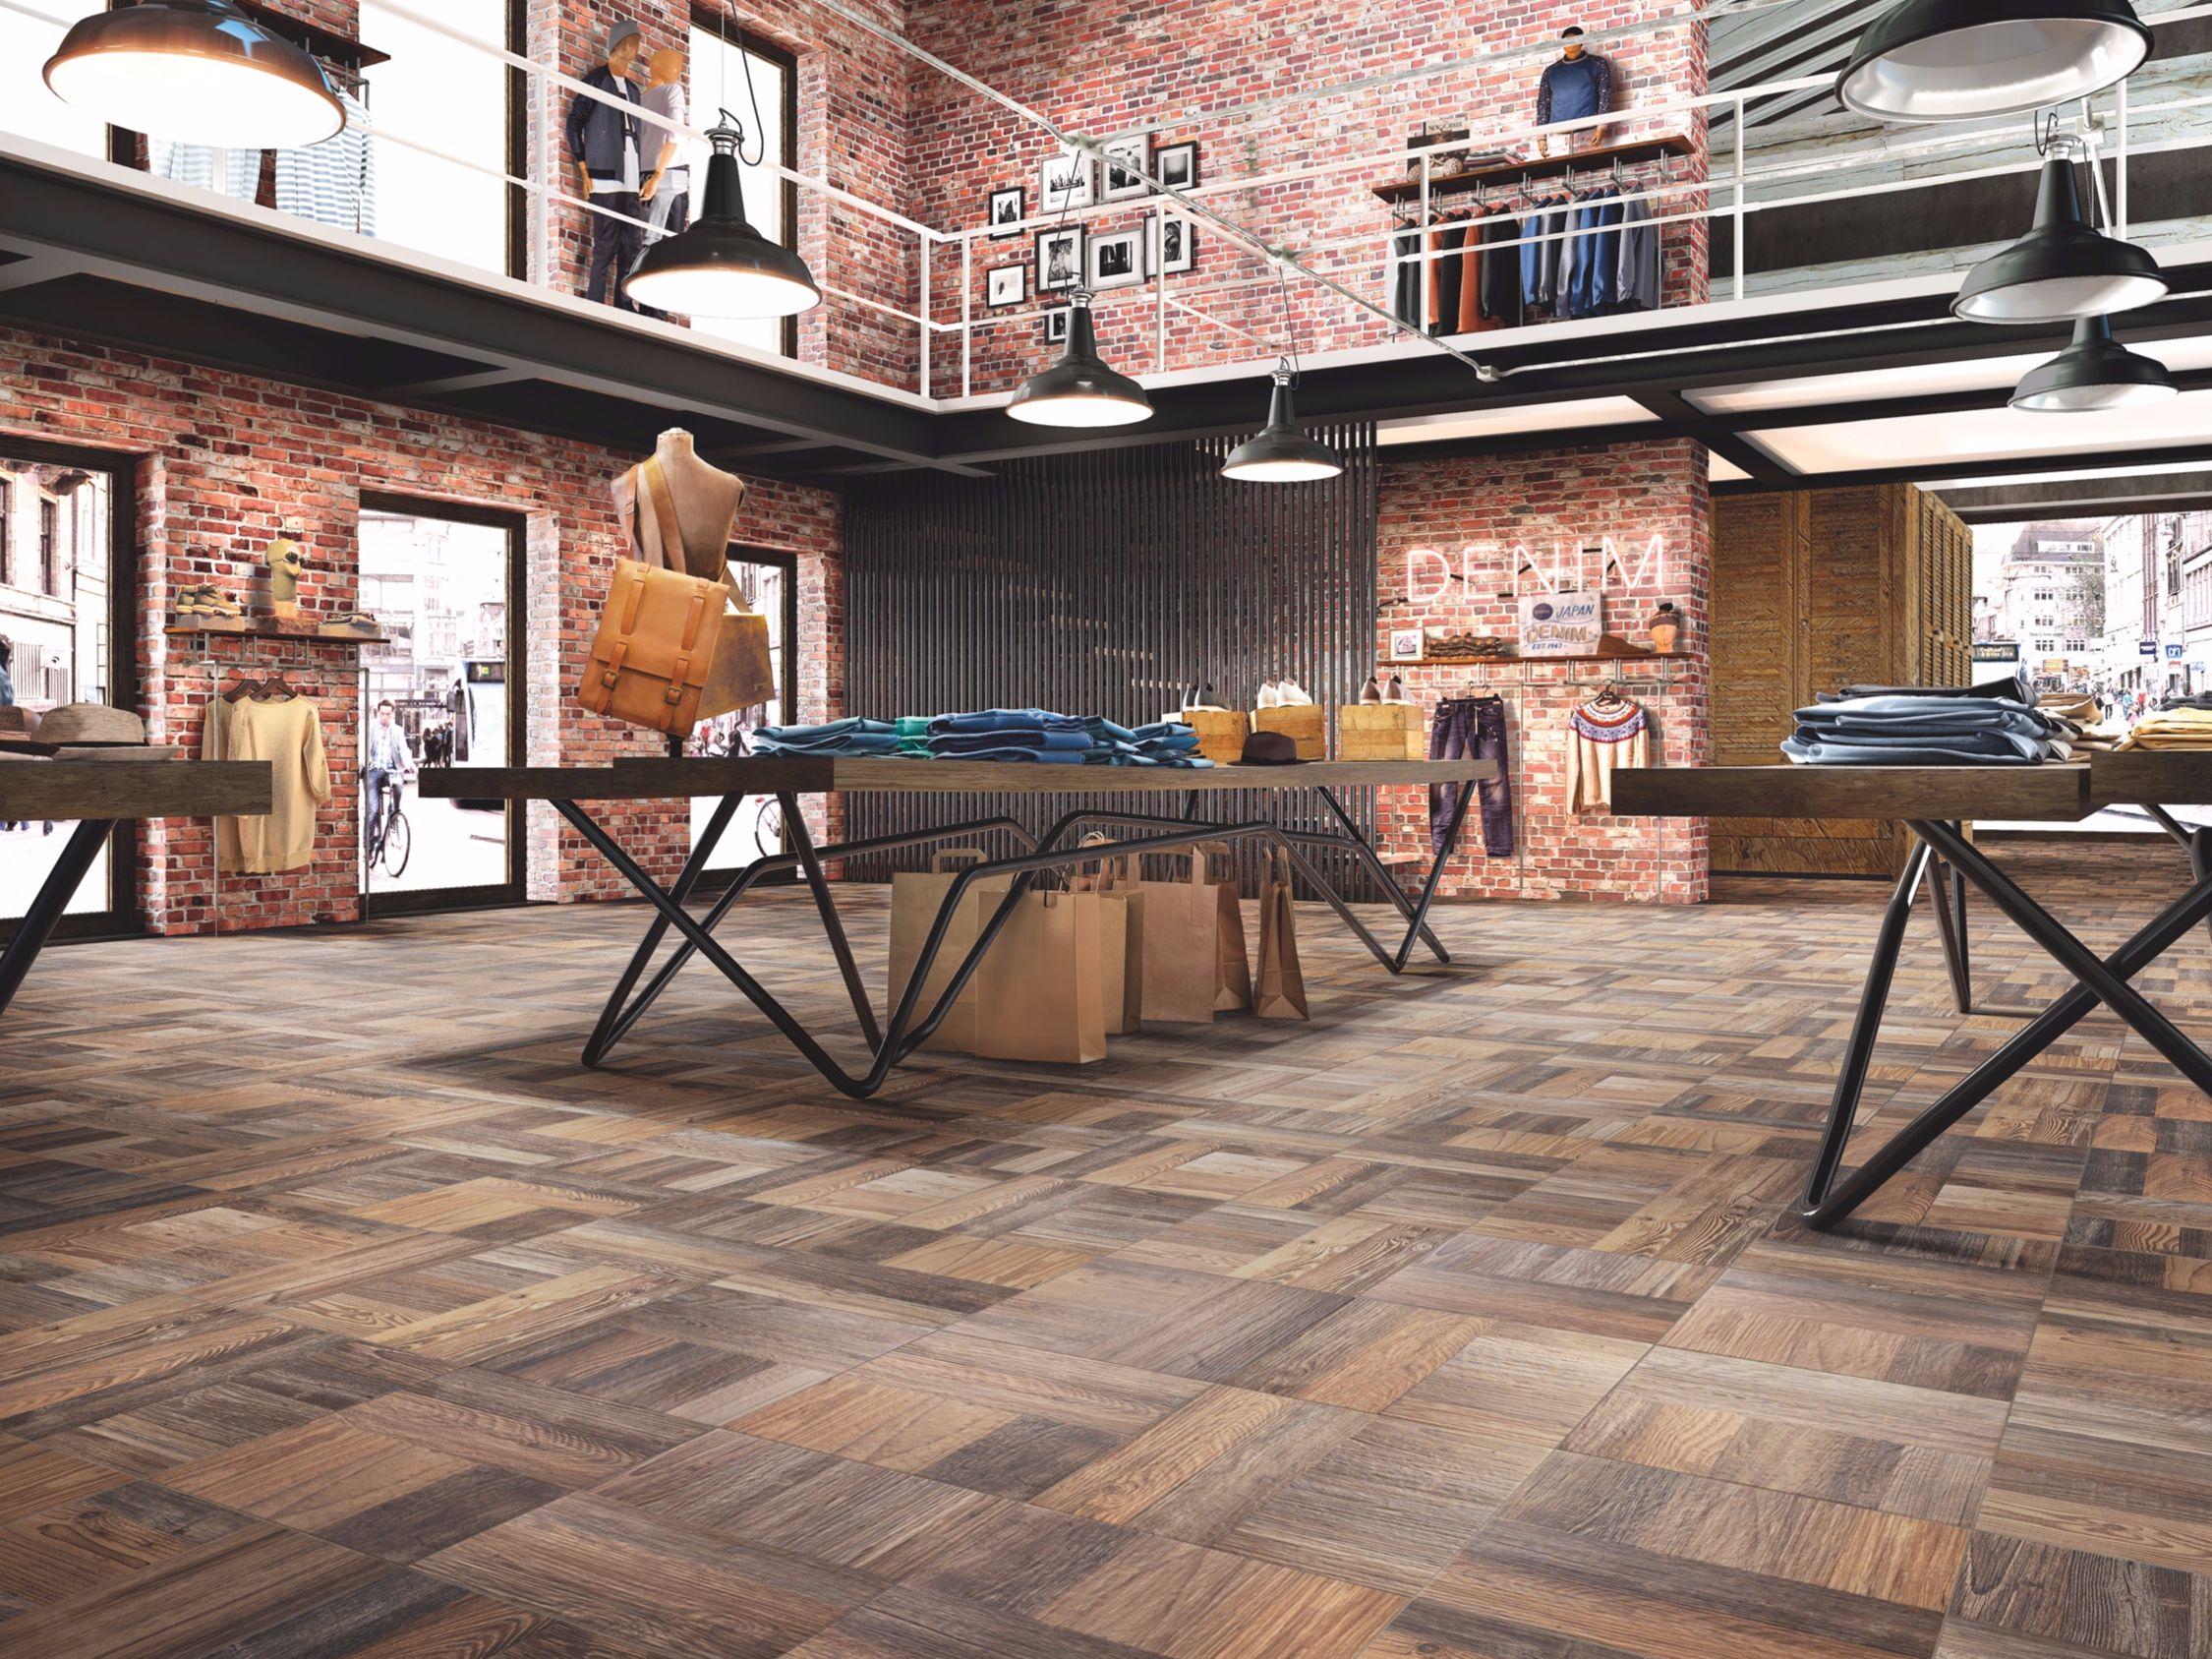 Pavimento in gres porcellanato effetto legno parchi - Casalgrande padana gres porcellanato ...